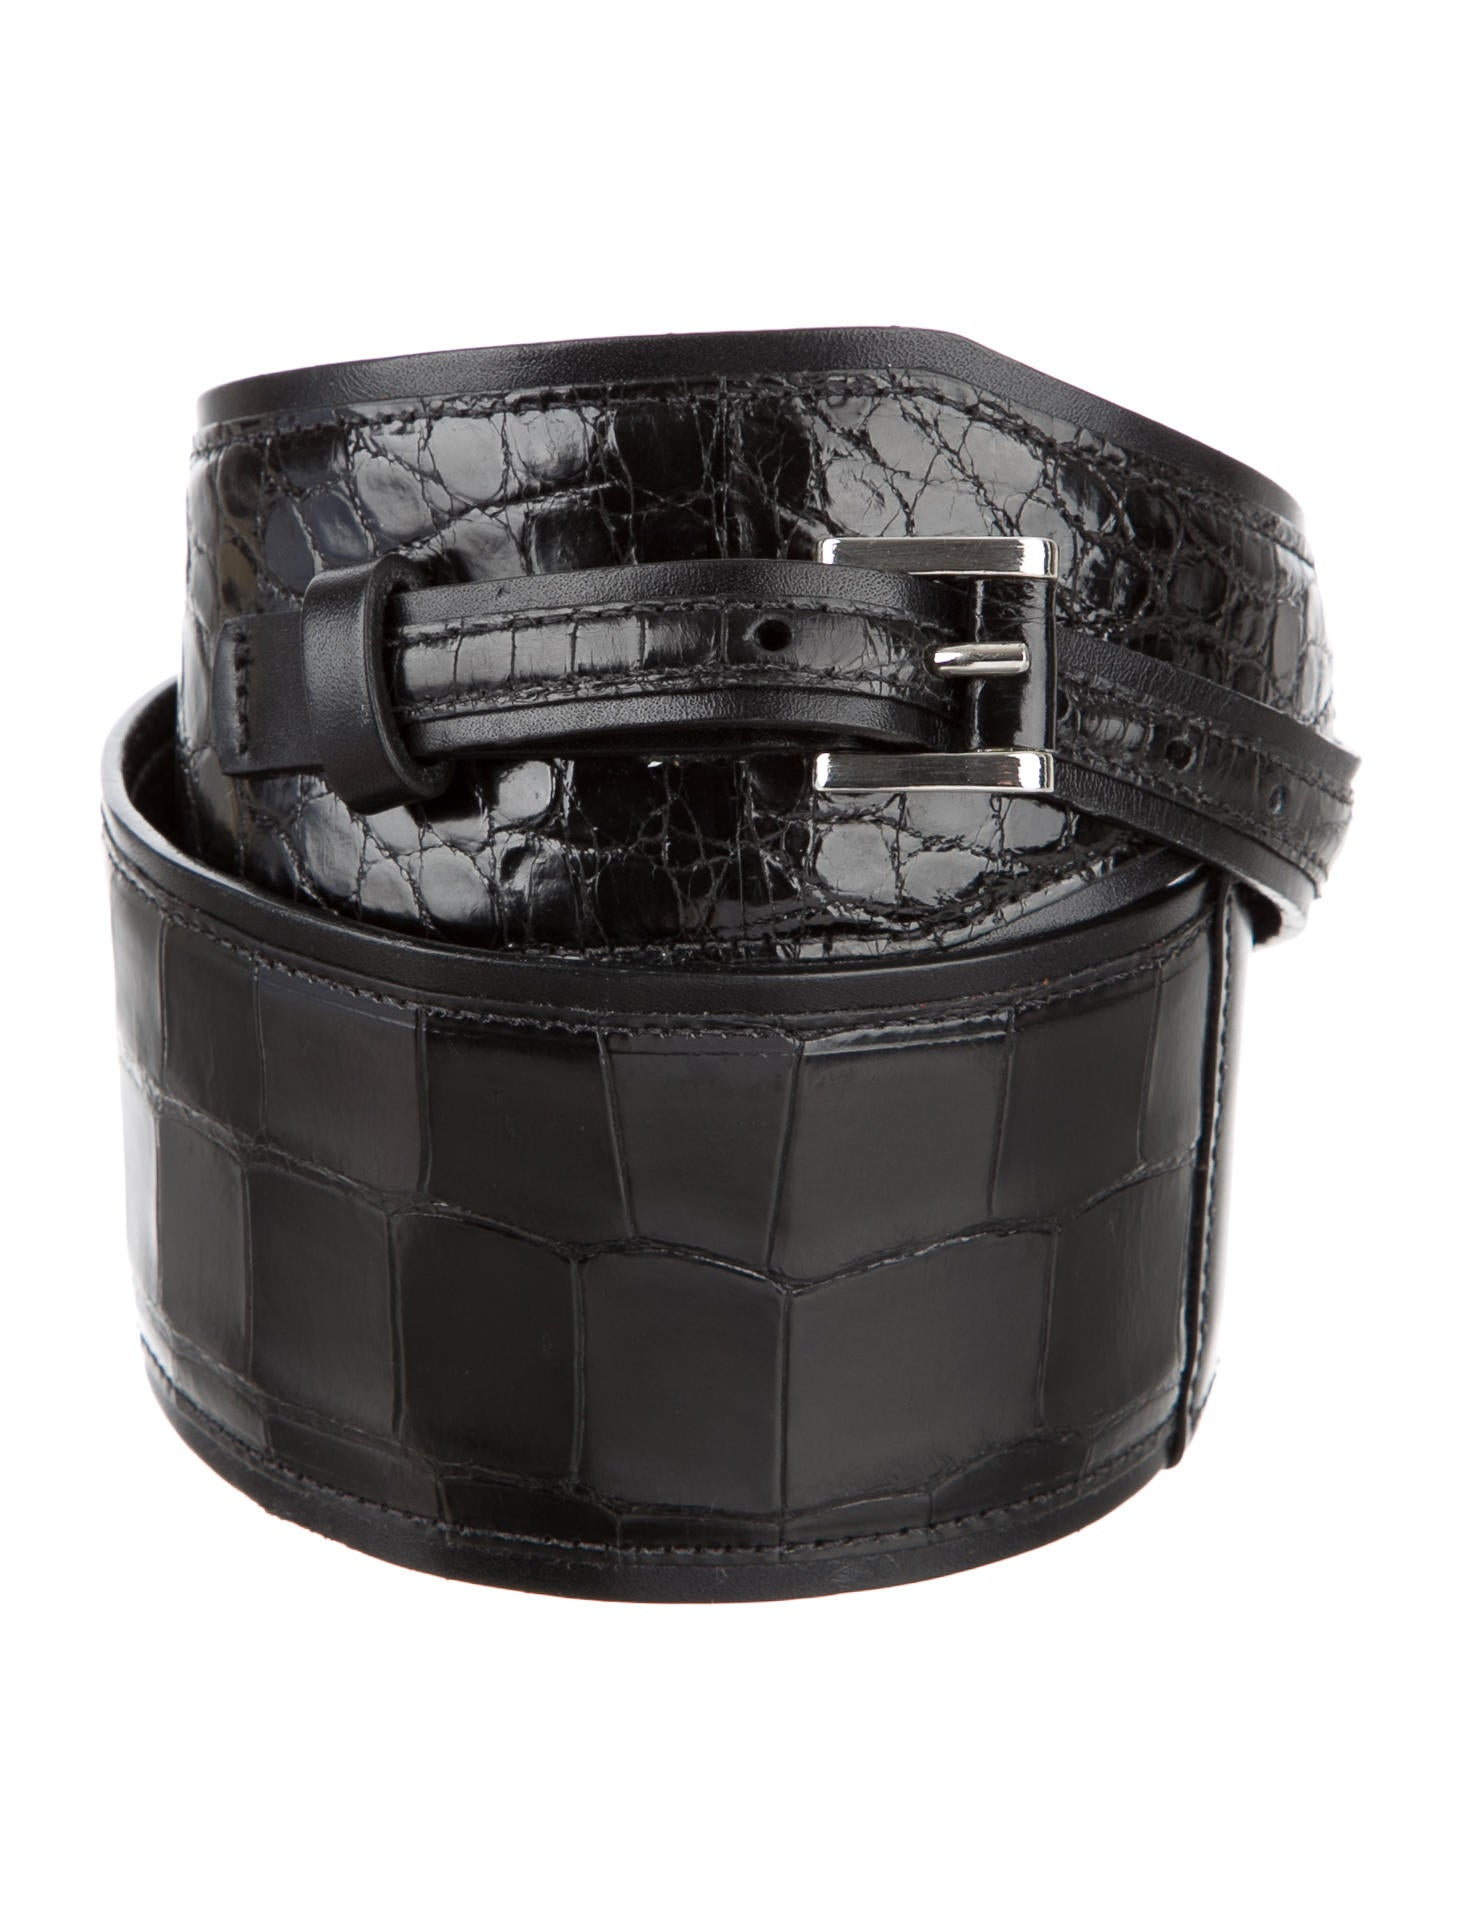 Oscar de la renta alligator waist belt accessories for Oscar de la renta candles